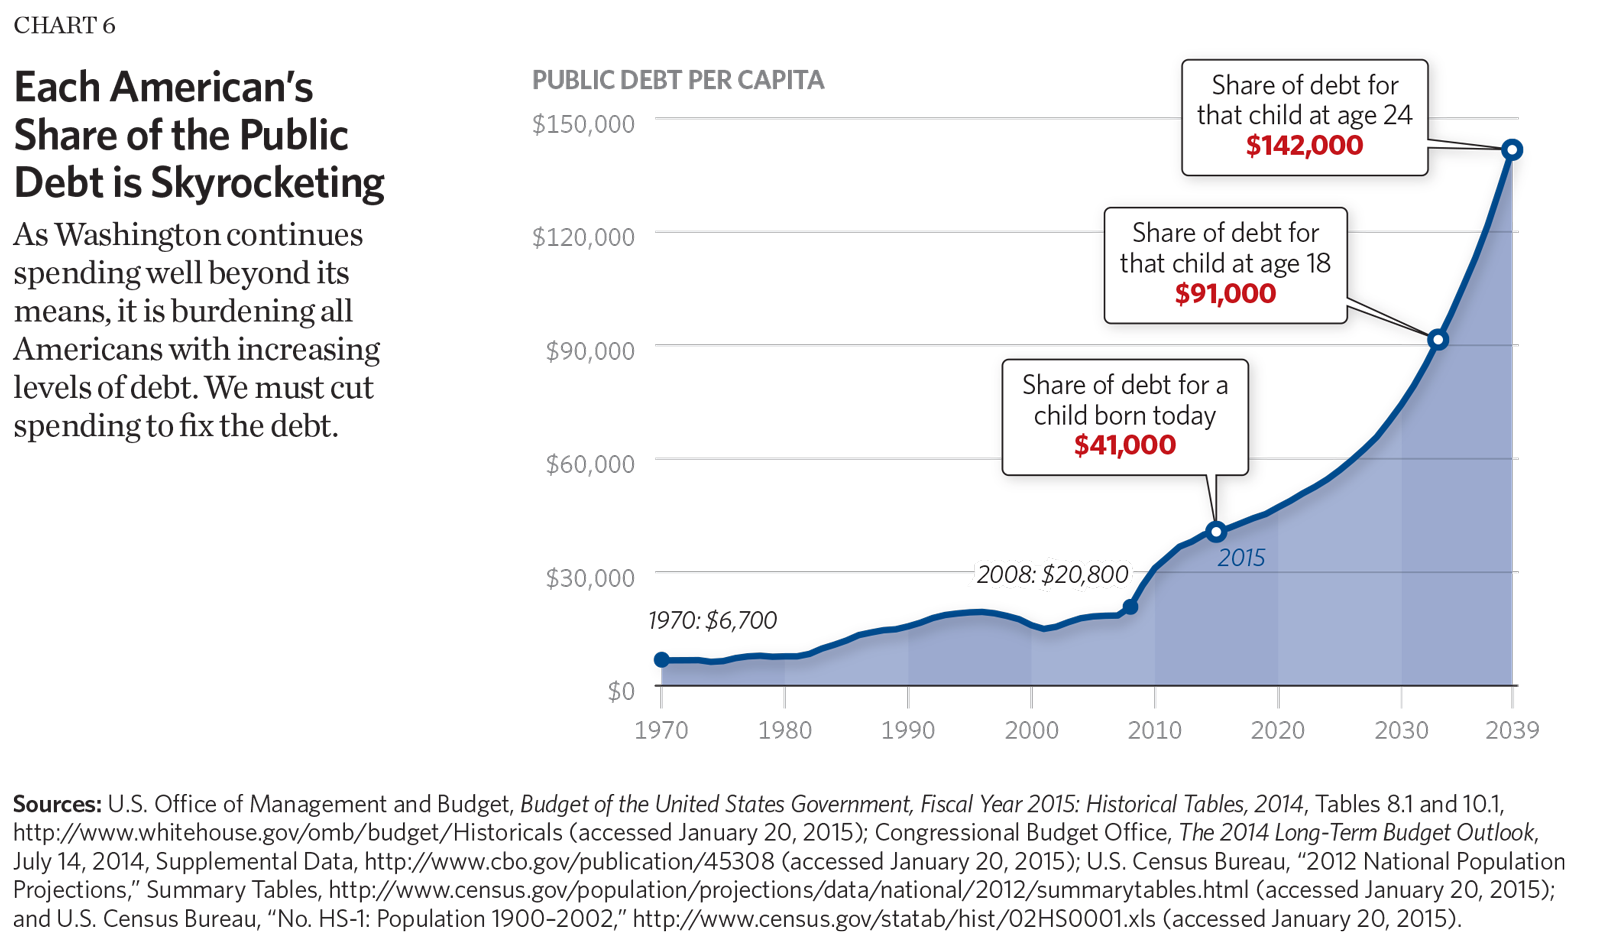 SR-budget-book-2015-chart-6-1600.png